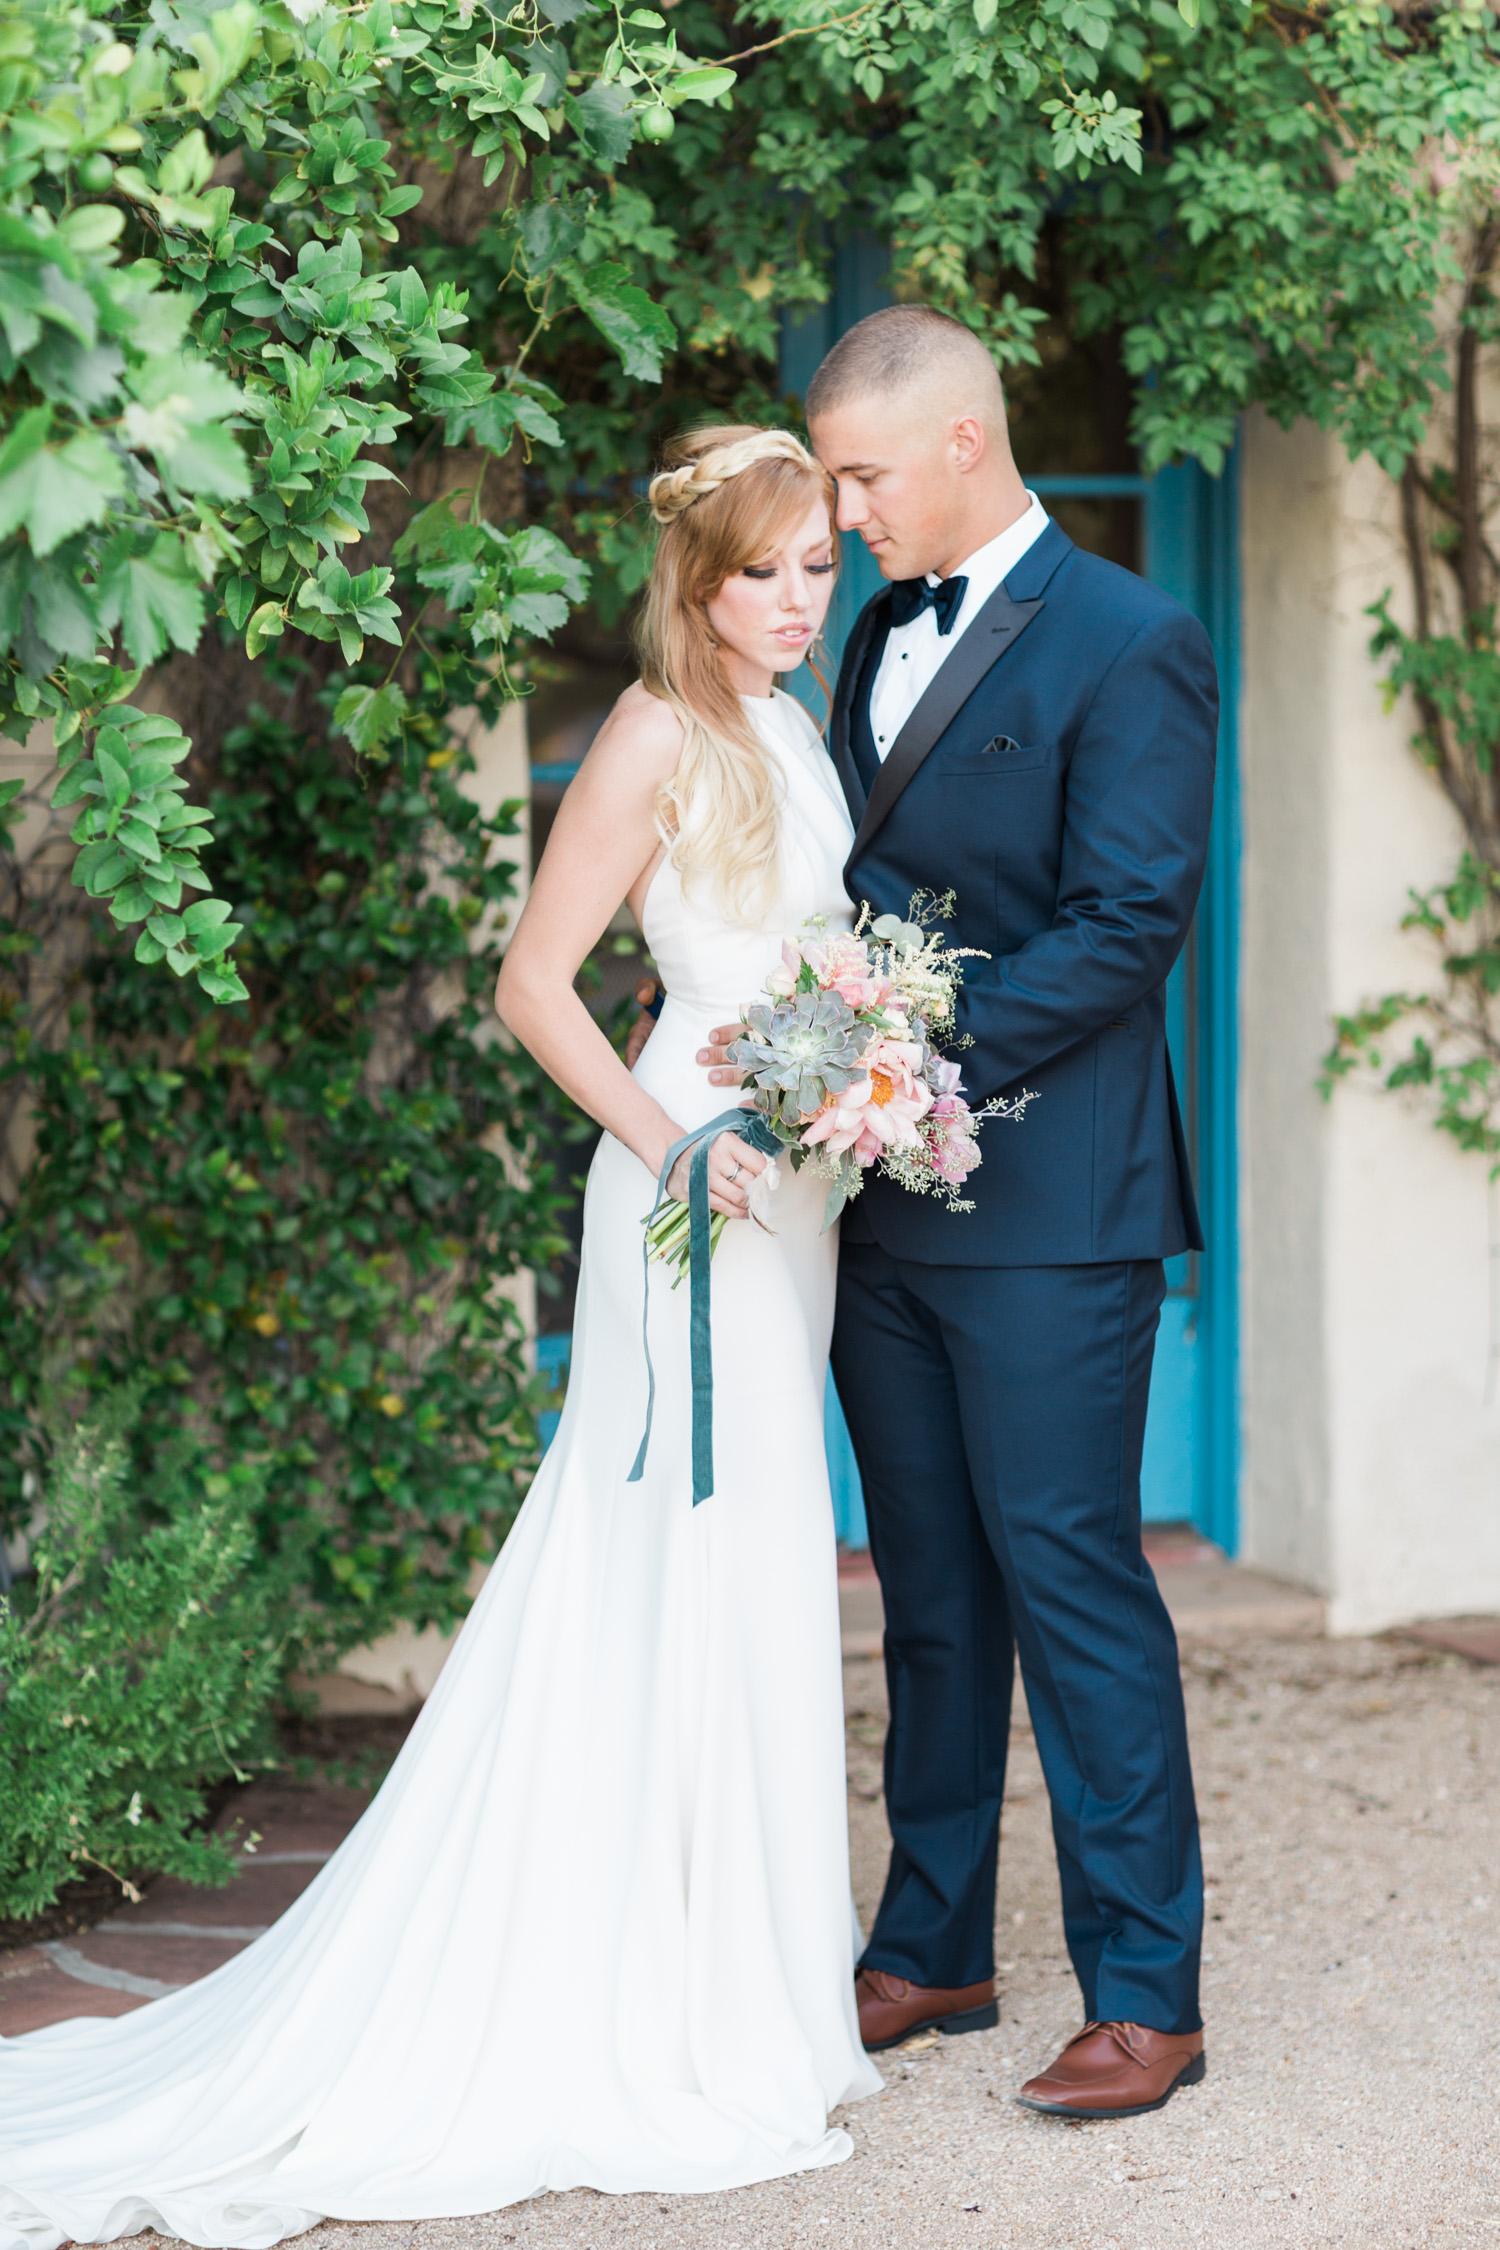 Couple embracing at Tohono Chul wedding in Tucson, Arizona